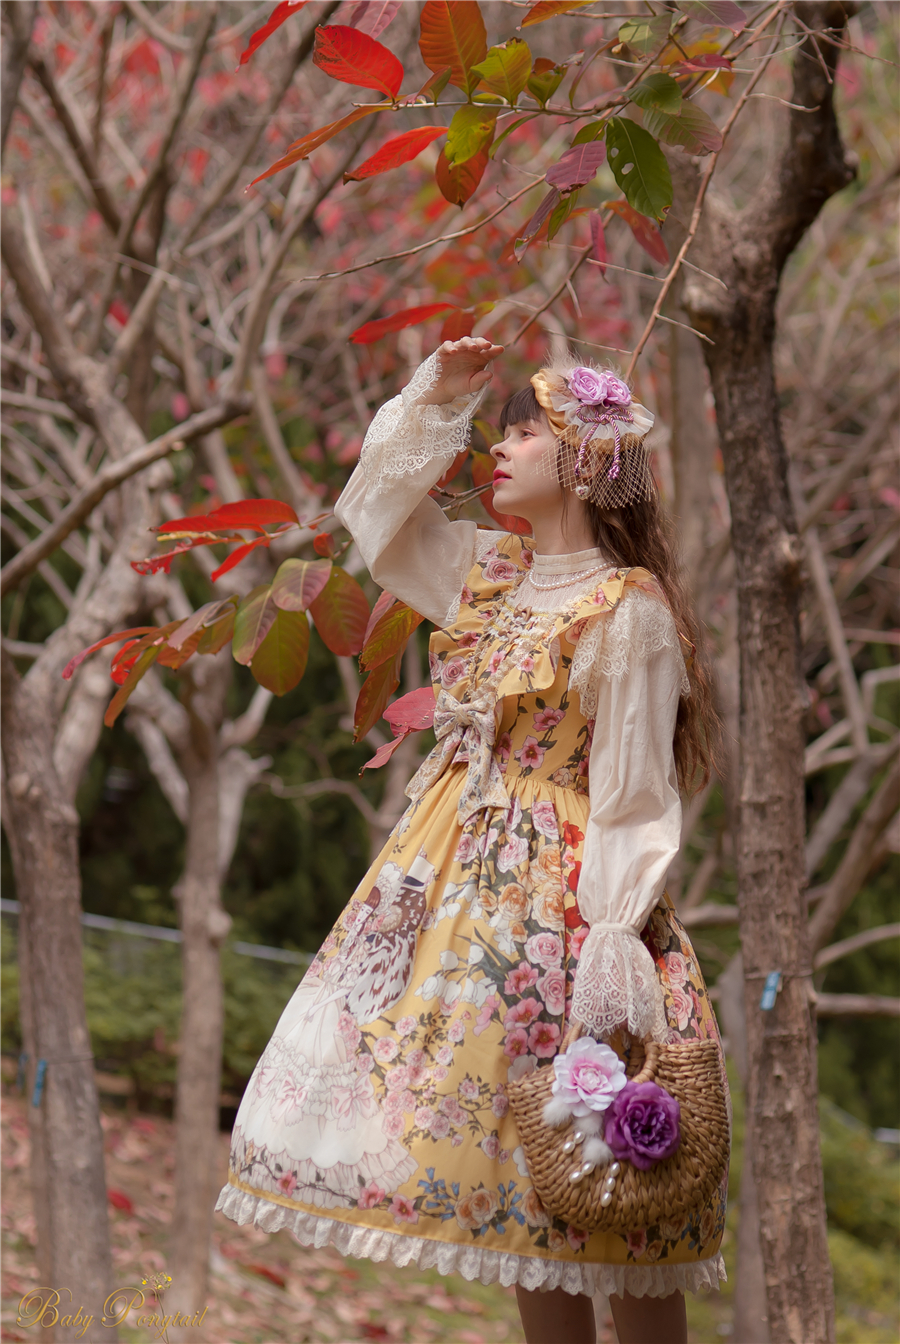 Baby Ponytail_Model Photo_Polly's Garden of Dreams_JSK Yellow_Claudia_0.jpg